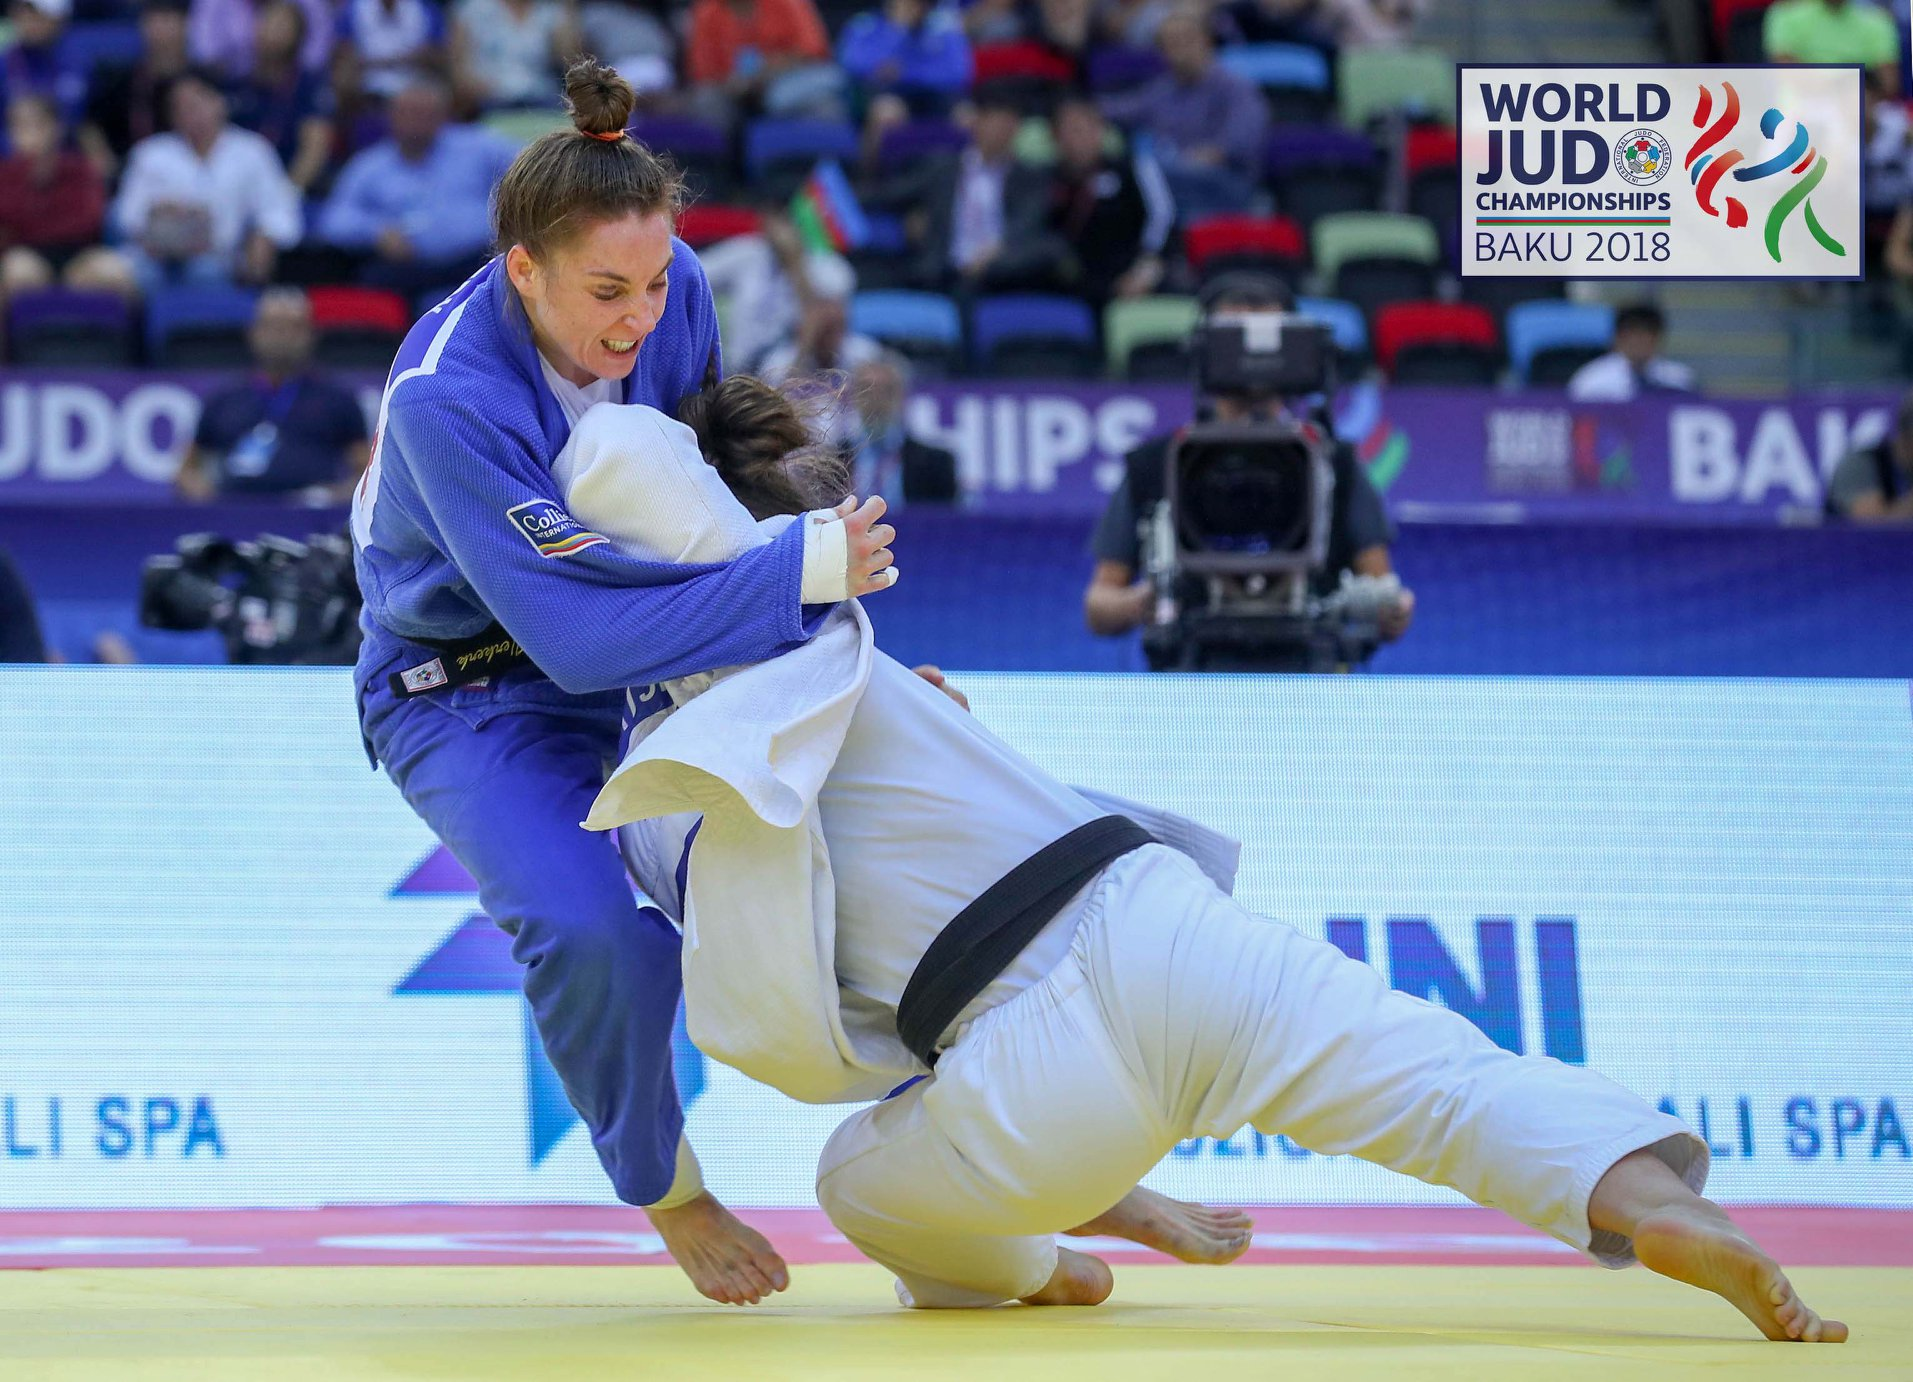 Daniela Krukower World Judo Champion